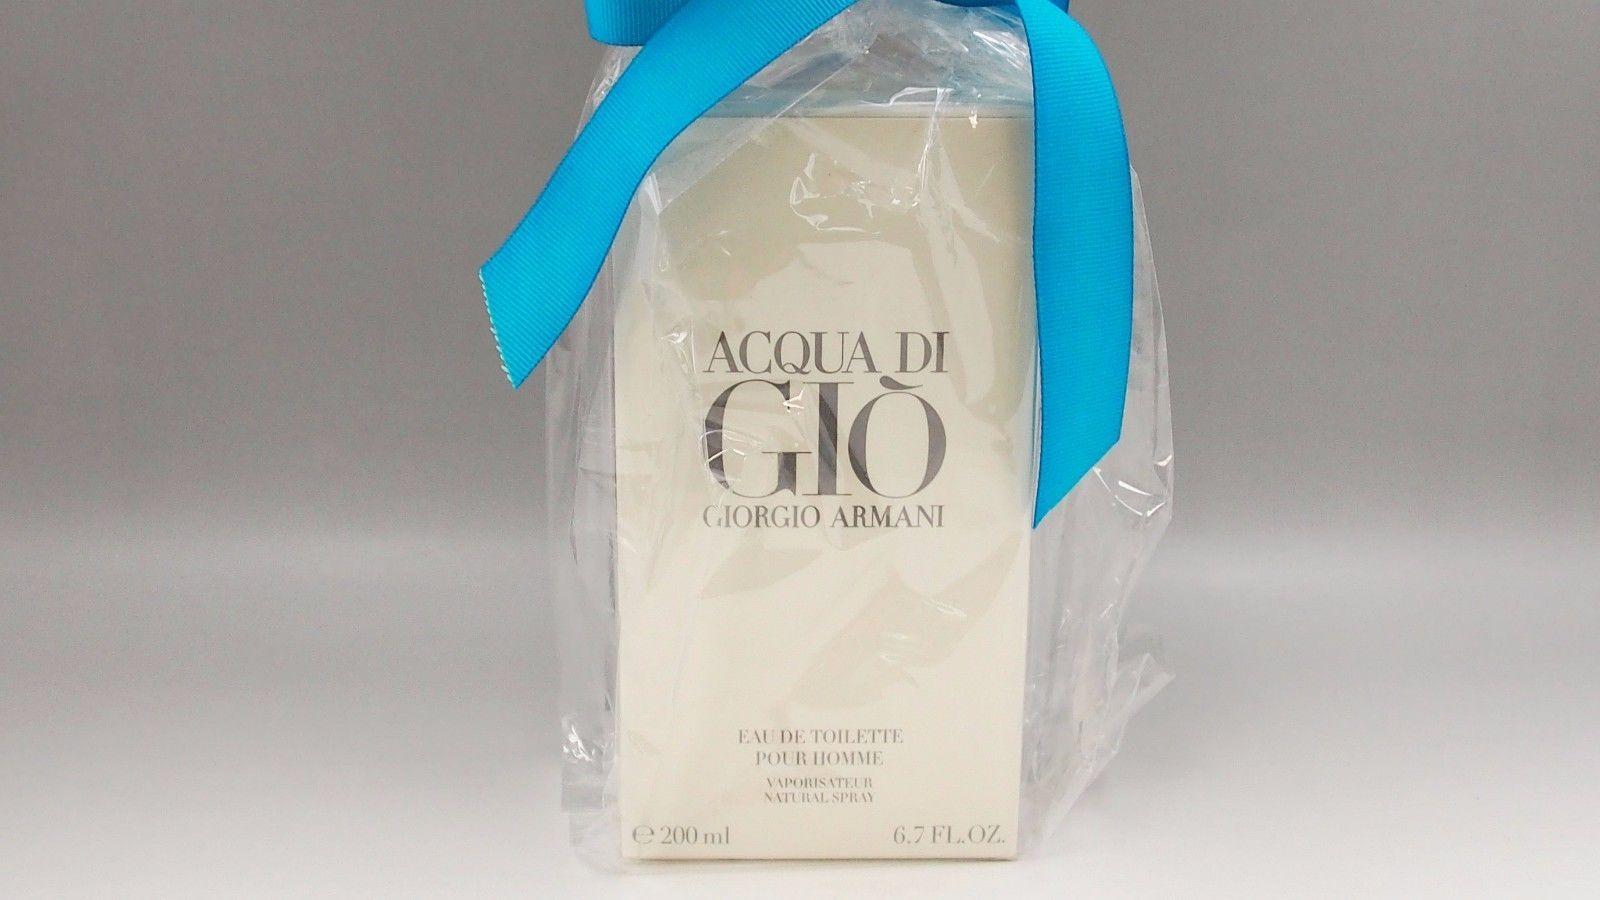 #Trending - Acqua Di Gio by Giorgio Armani Eau De Toilette 6.7 oz 200ml For Men https://t.co/mVMsyhX70y Ebay https://t.co/tkAUdKh7eg